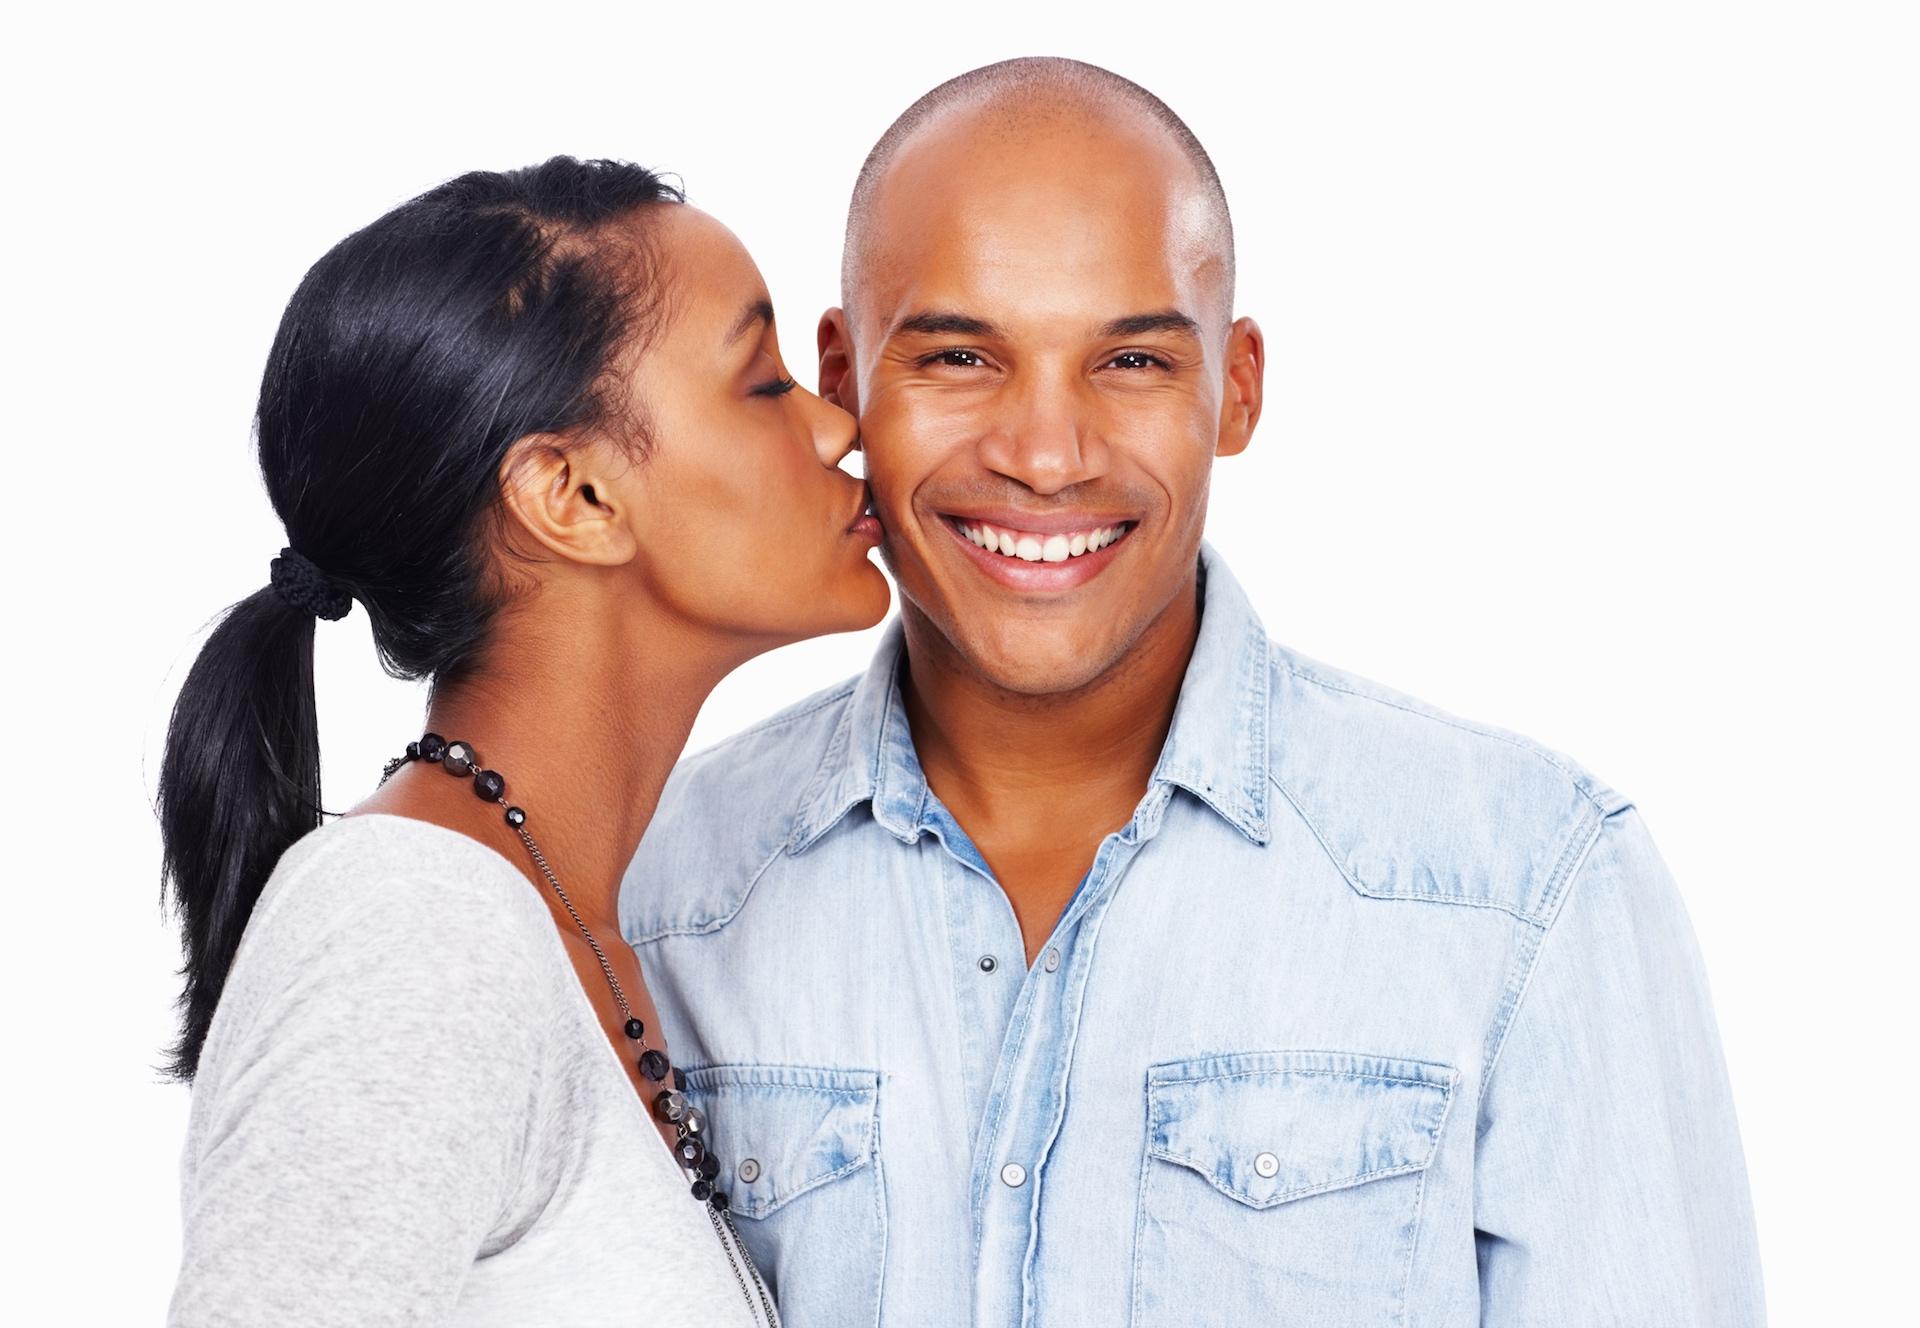 Avoid friend zone dating